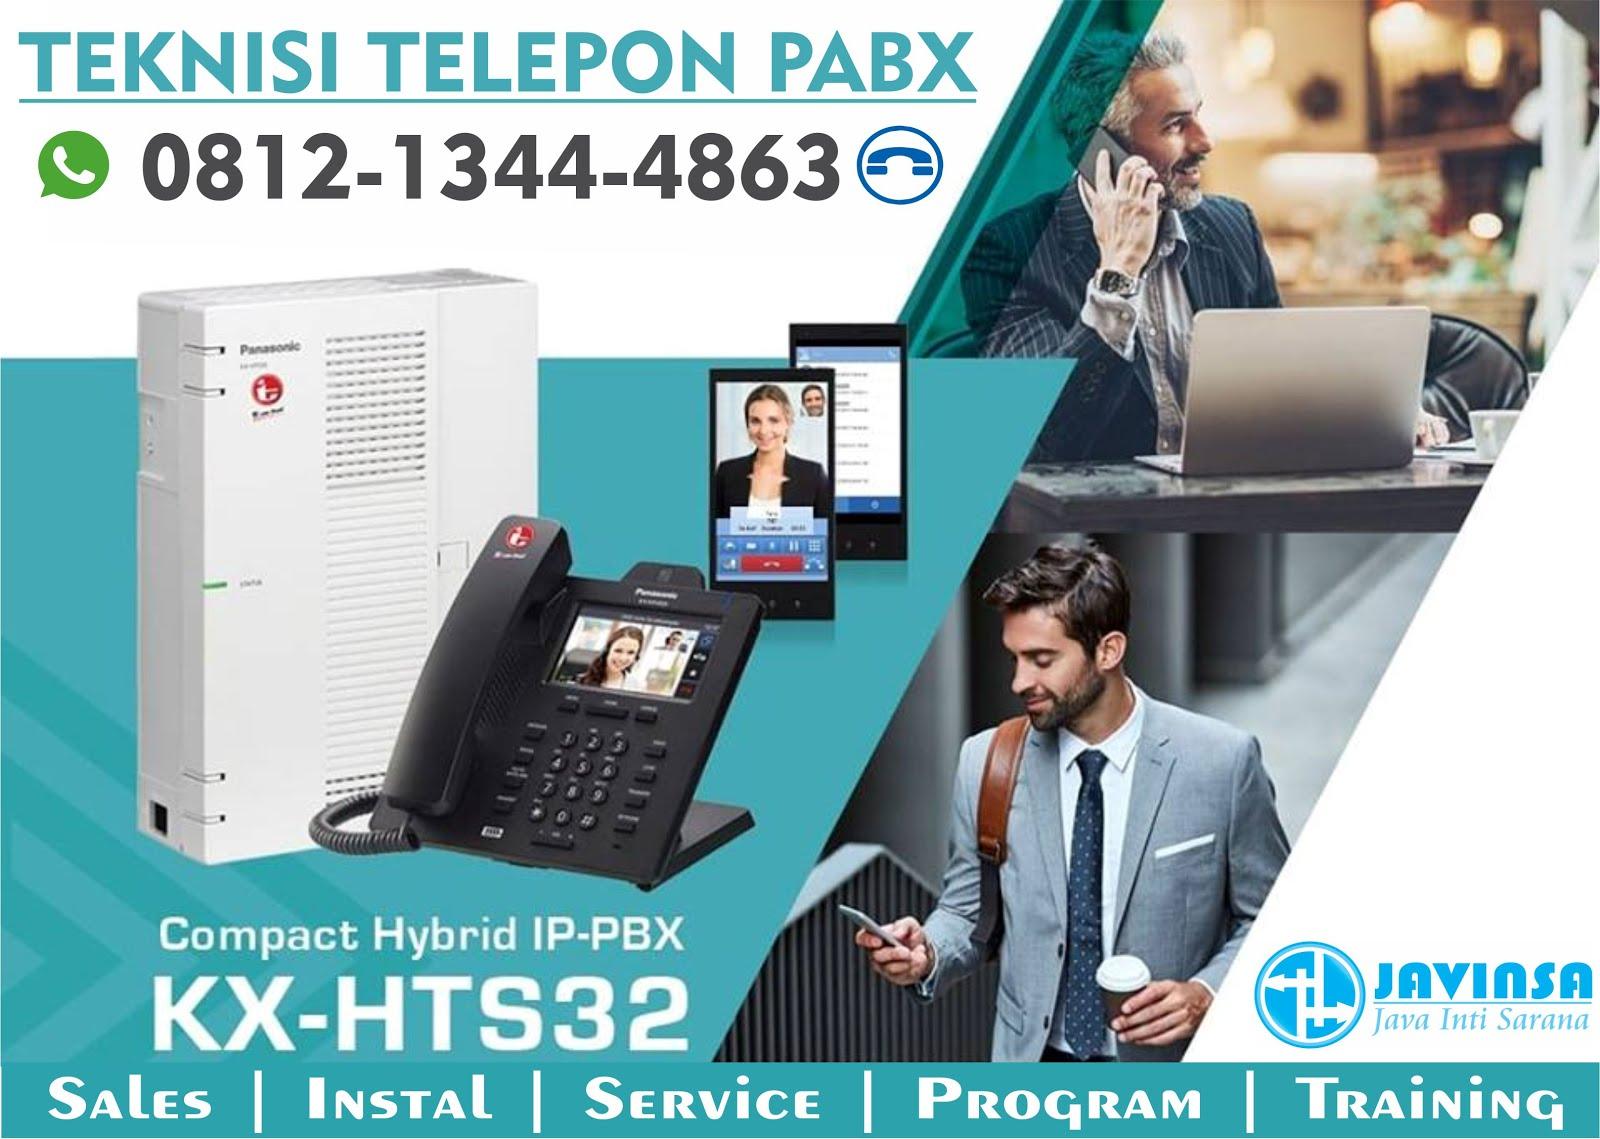 Java Inti Sarana | Teknisi Telepon PABX Panasonic